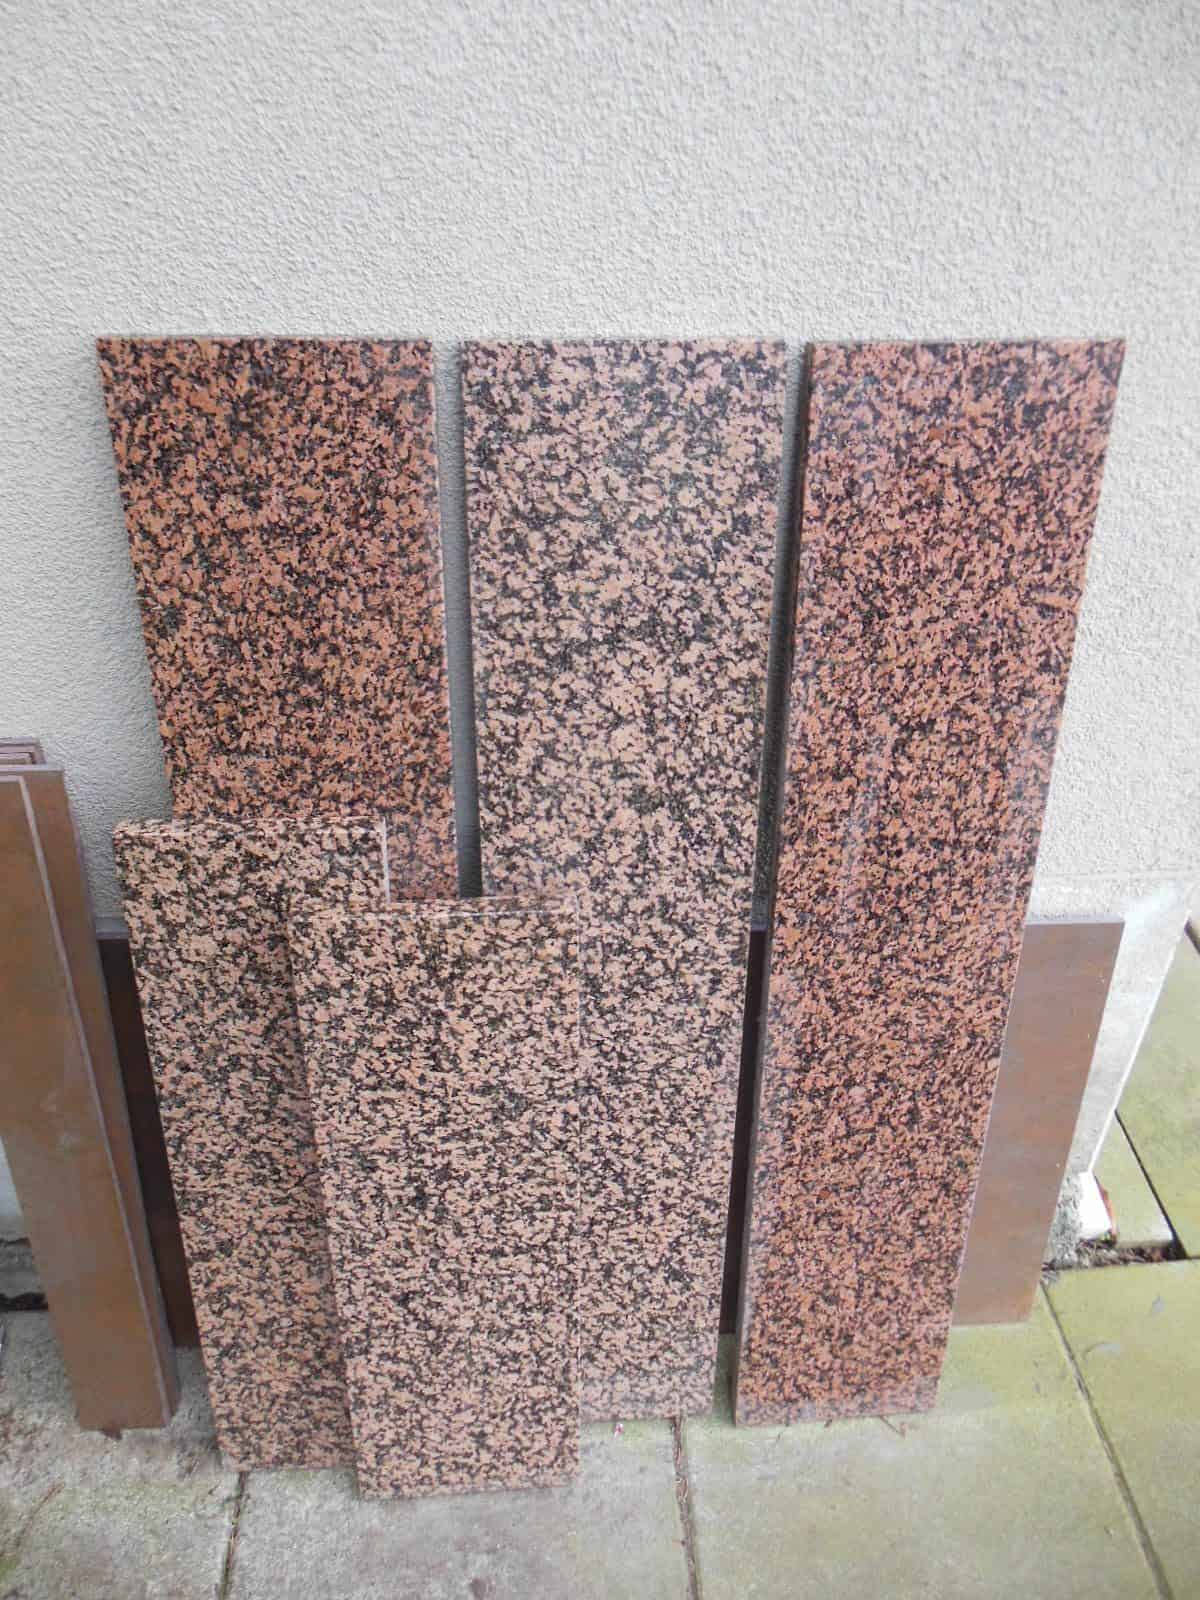 Fensterbänke aus rot/schwarzen Granit